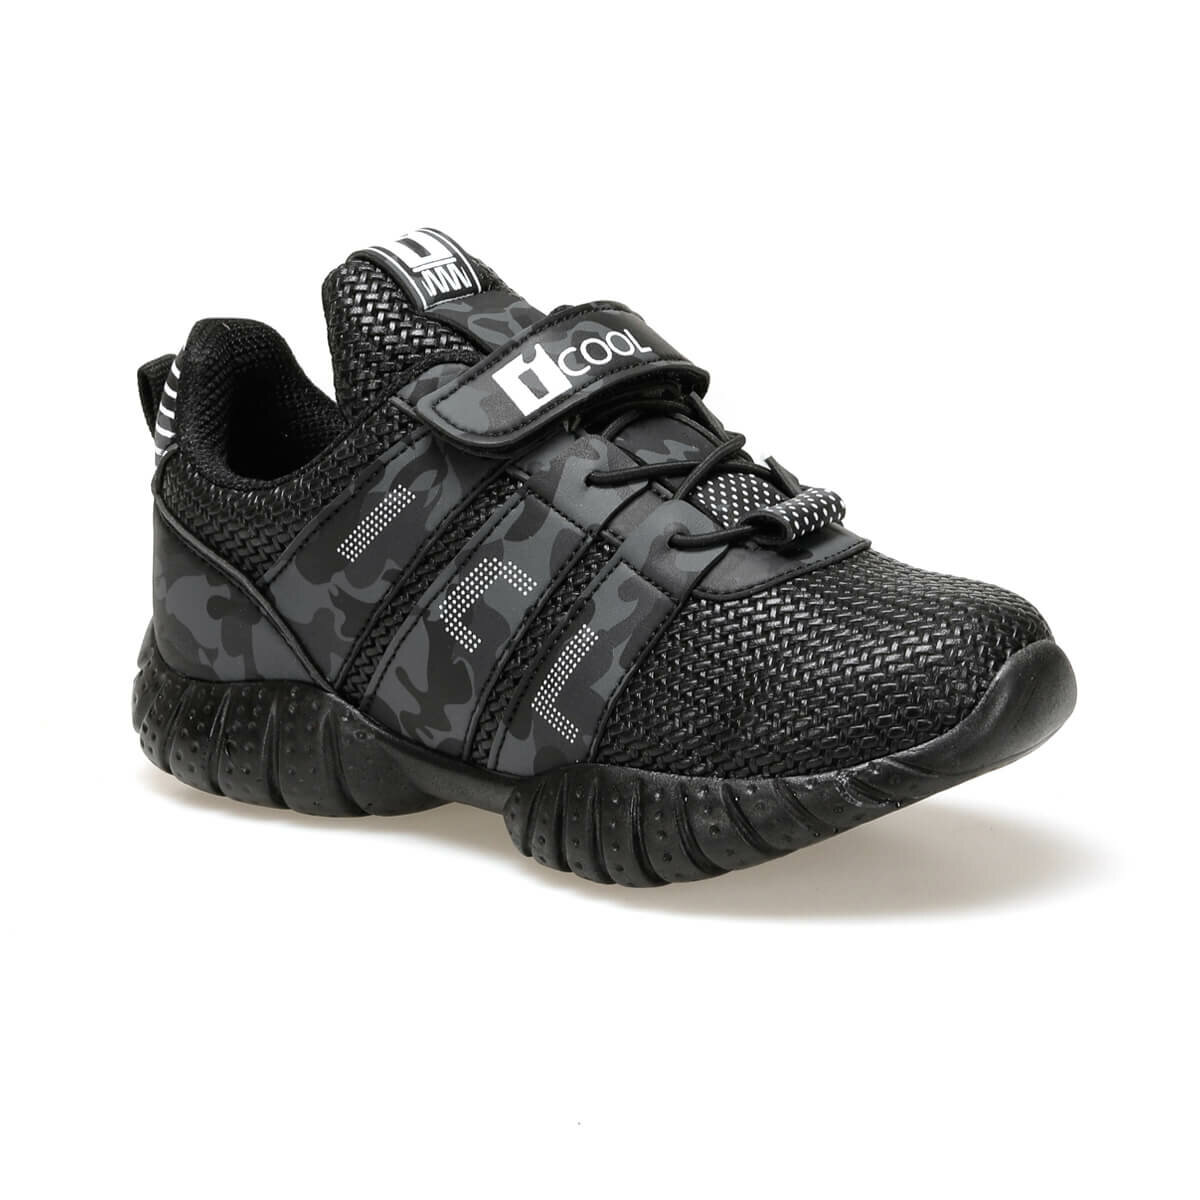 FLO TREE Black Male Child Hiking Shoes I-Cool